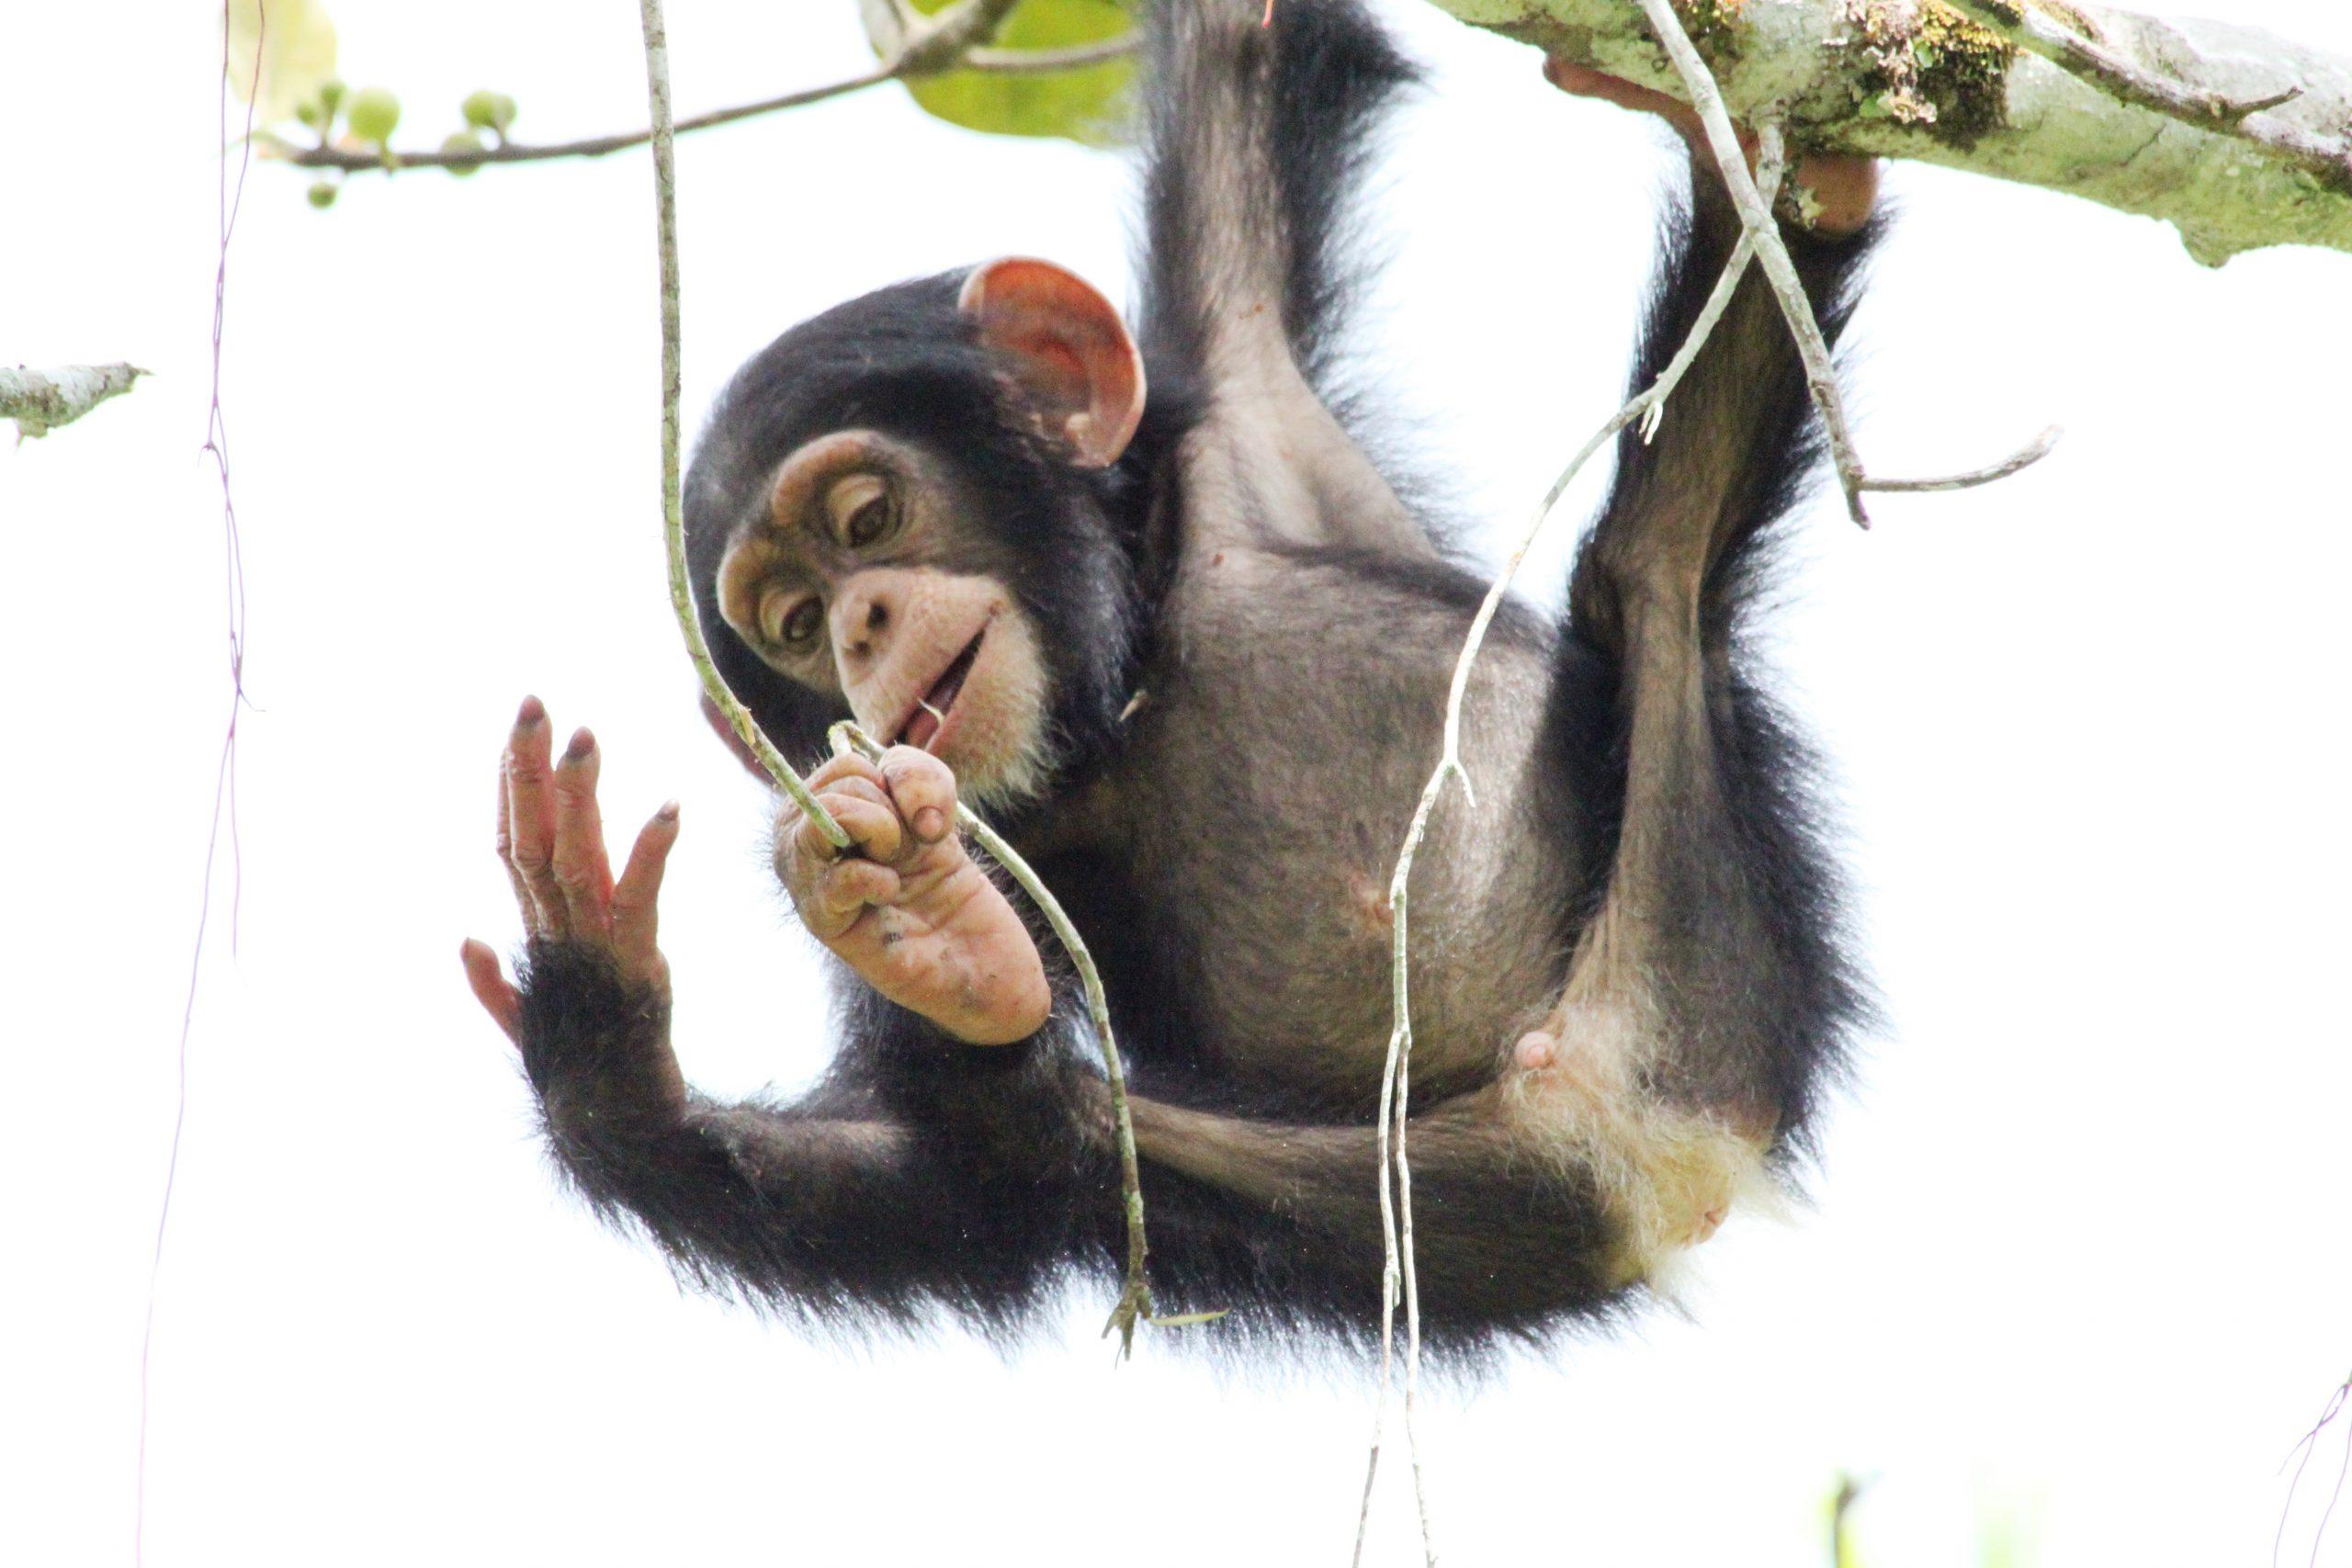 Tool use is 'innate' in chimpanzees, but not bonobos